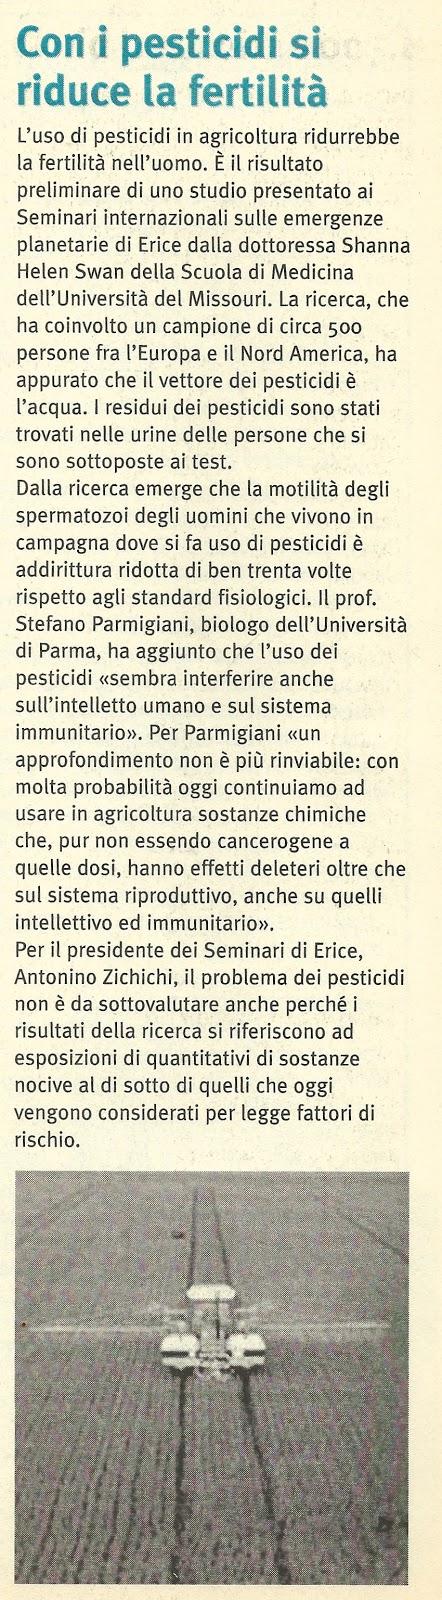 pesticidi rischio fertilità